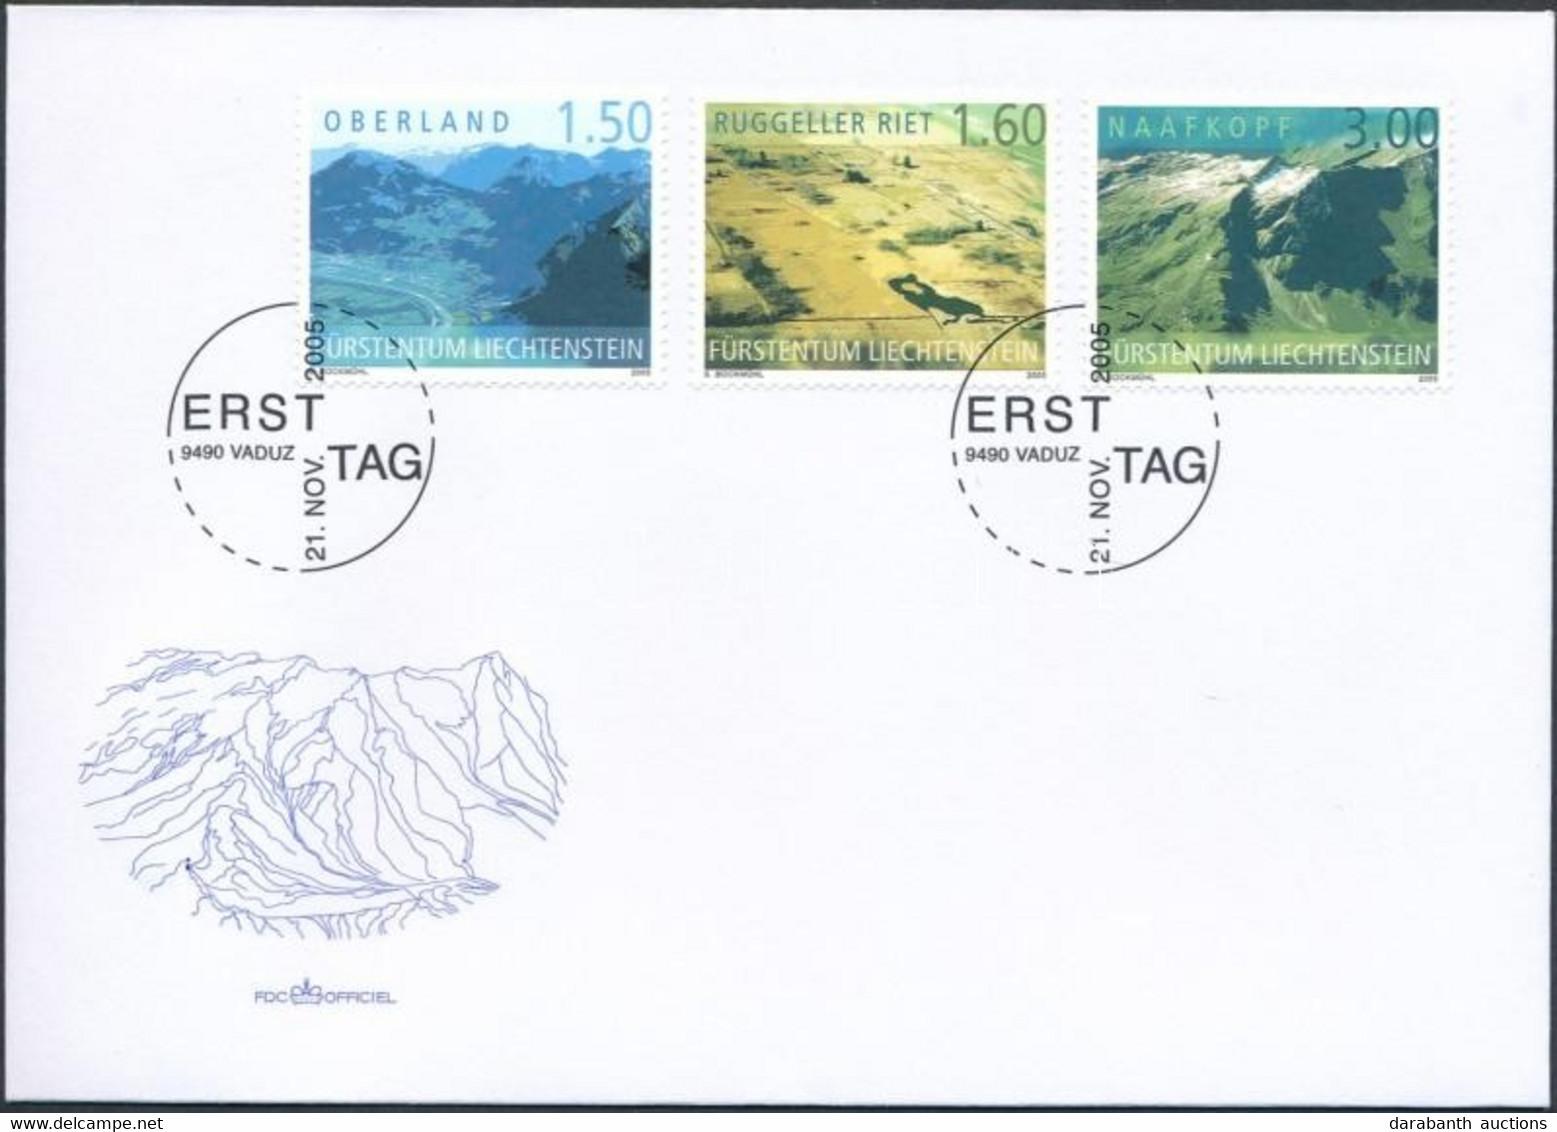 2005 Légi Felvételek Liechtensteinről Sor Mi 1397-1399 FDC - Non Classificati